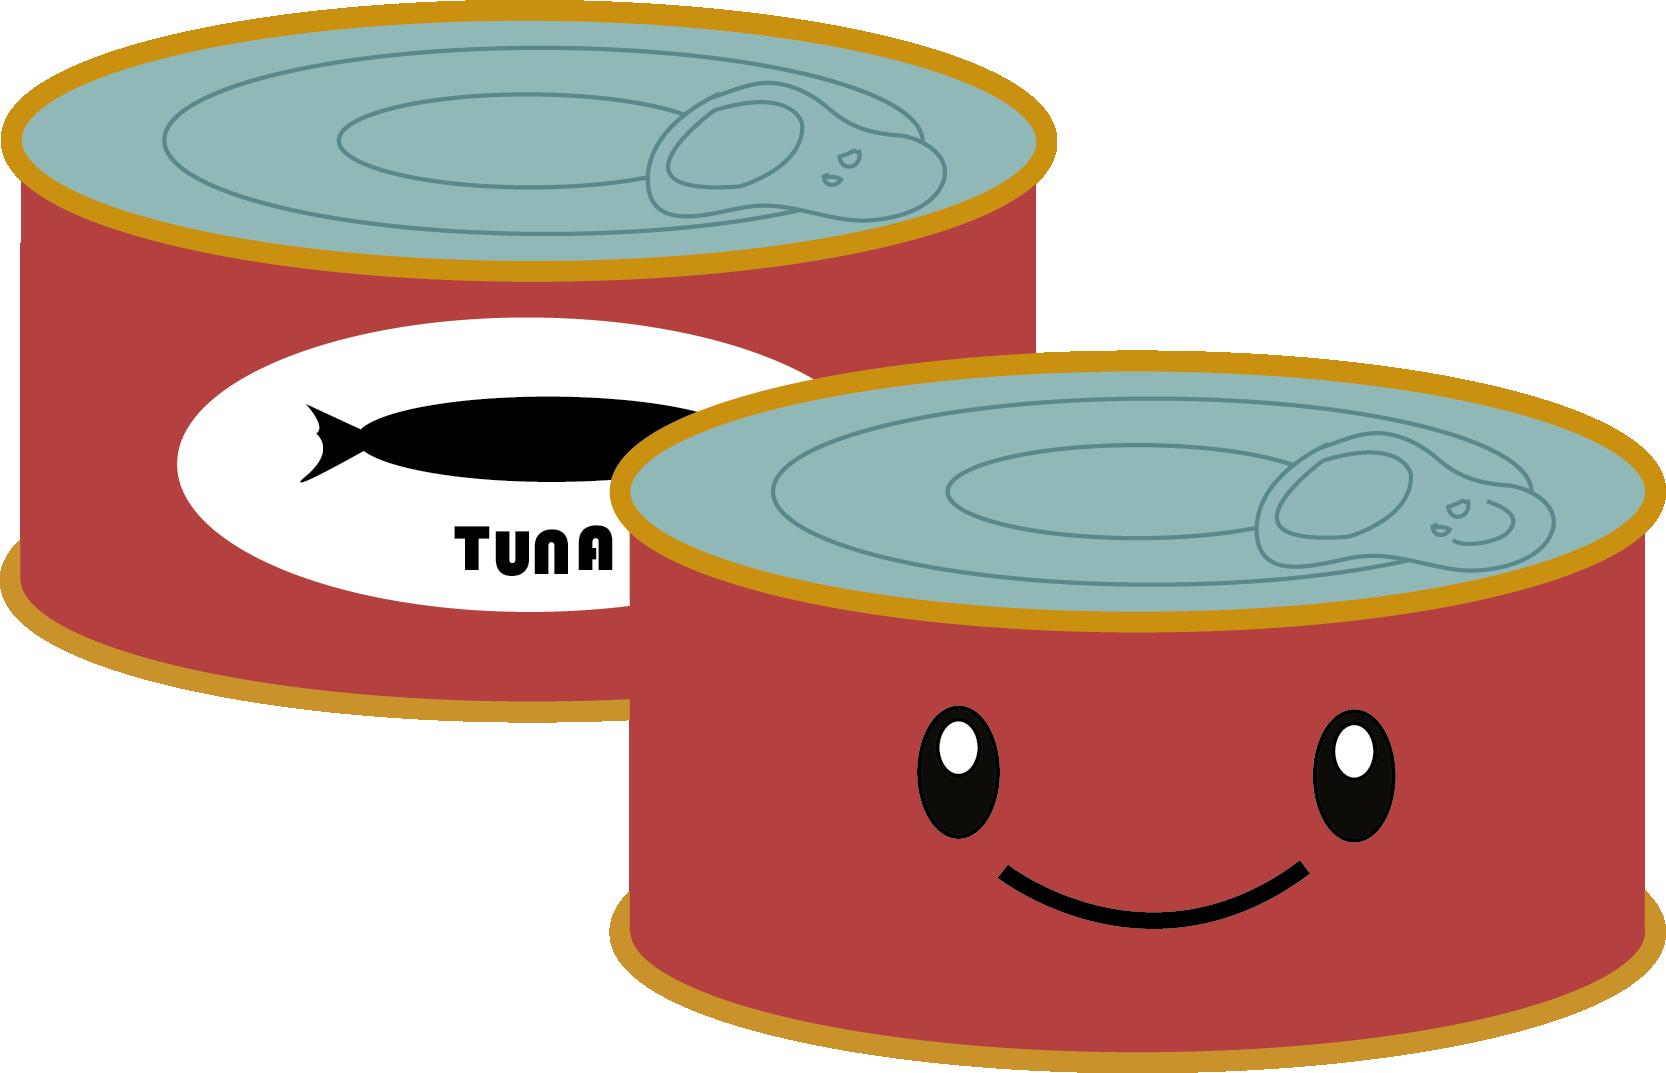 Tuna clipart tuna salad. Protein curriculm nutrition education